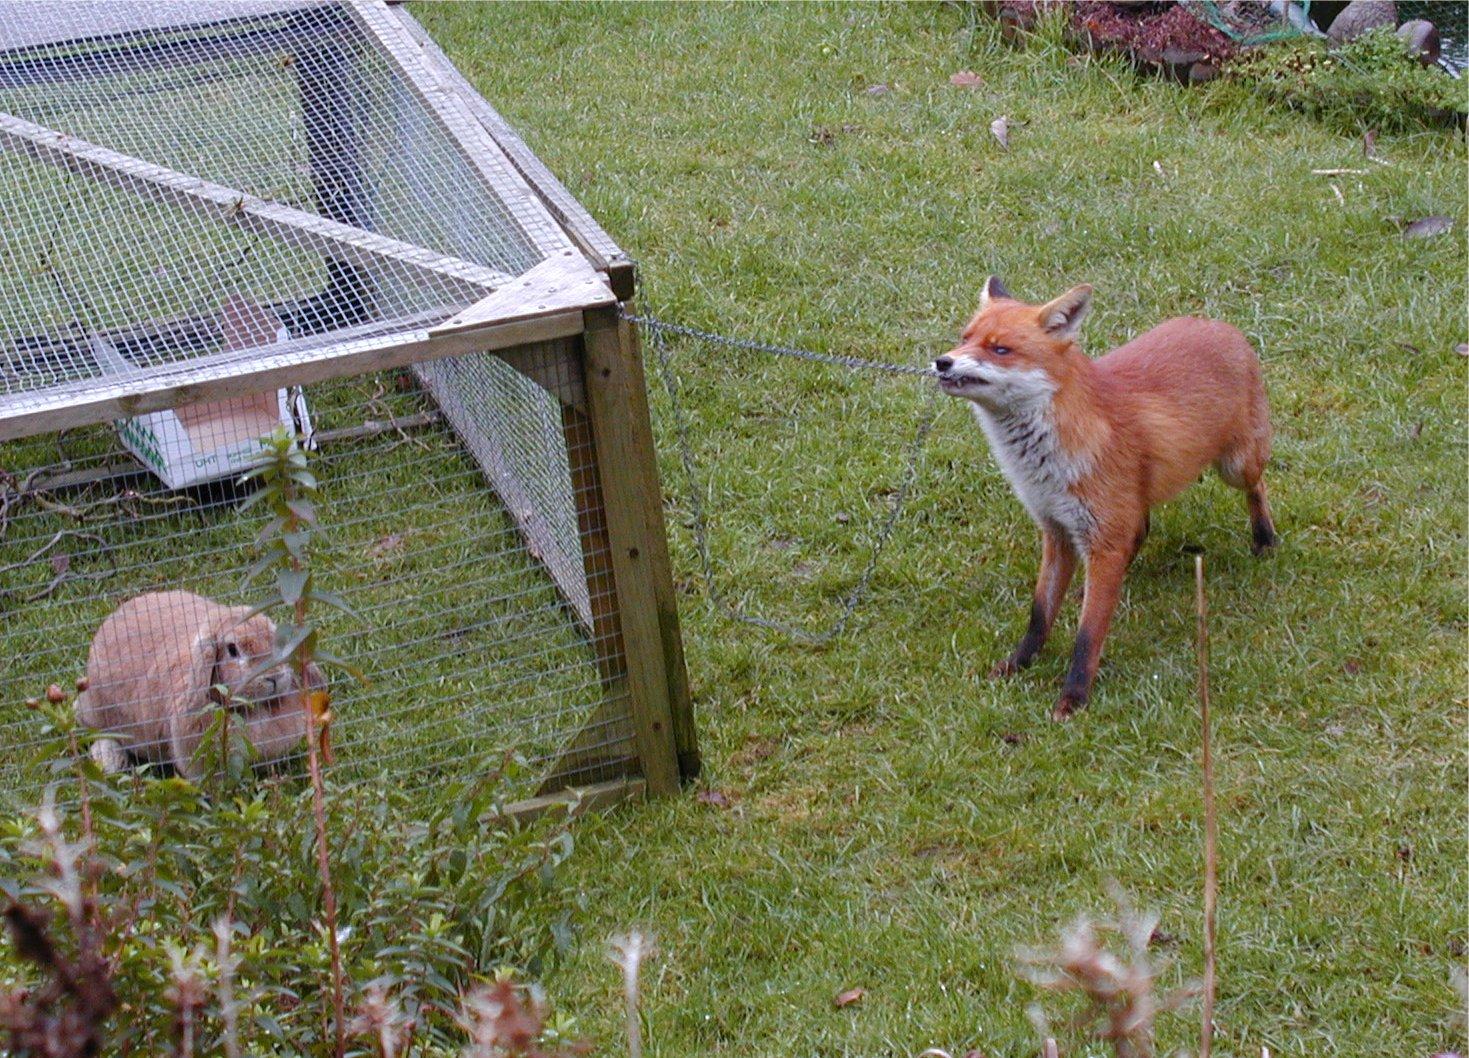 Fox in a Birmingham garden investigates a rabbit hutch. Photo taken on January 10, 2000.